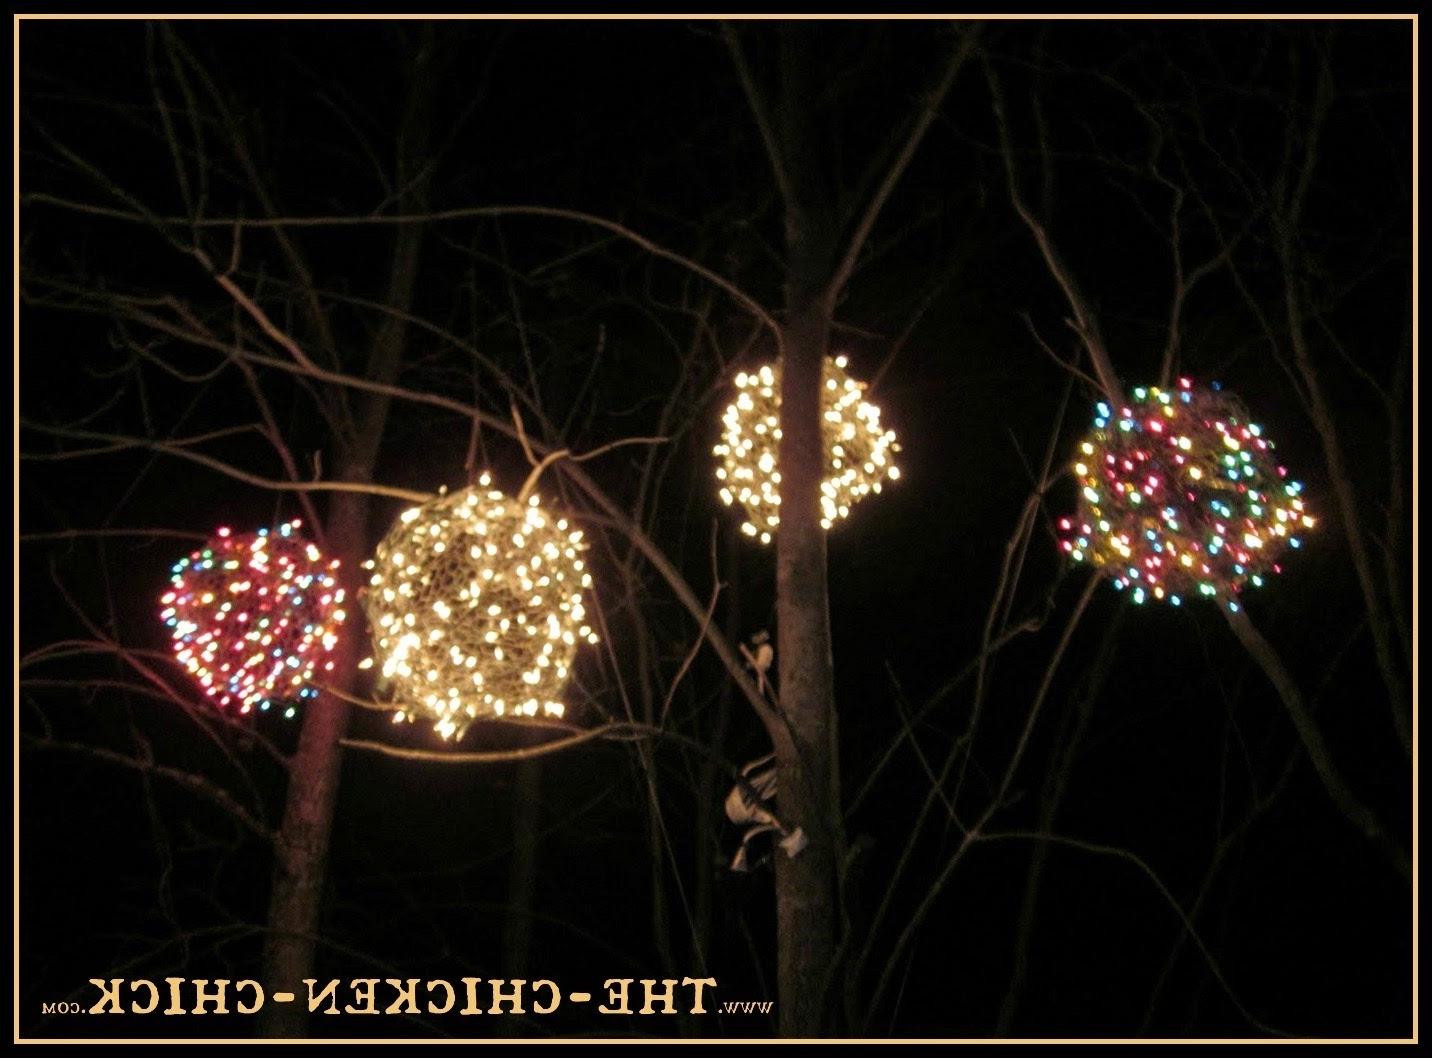 Outdoor Hanging Sphere Lights Regarding Most Up To Date Diy : Outdoor Christmas Ball Lights Outdoor Christmas Sphere Lights (View 10 of 20)